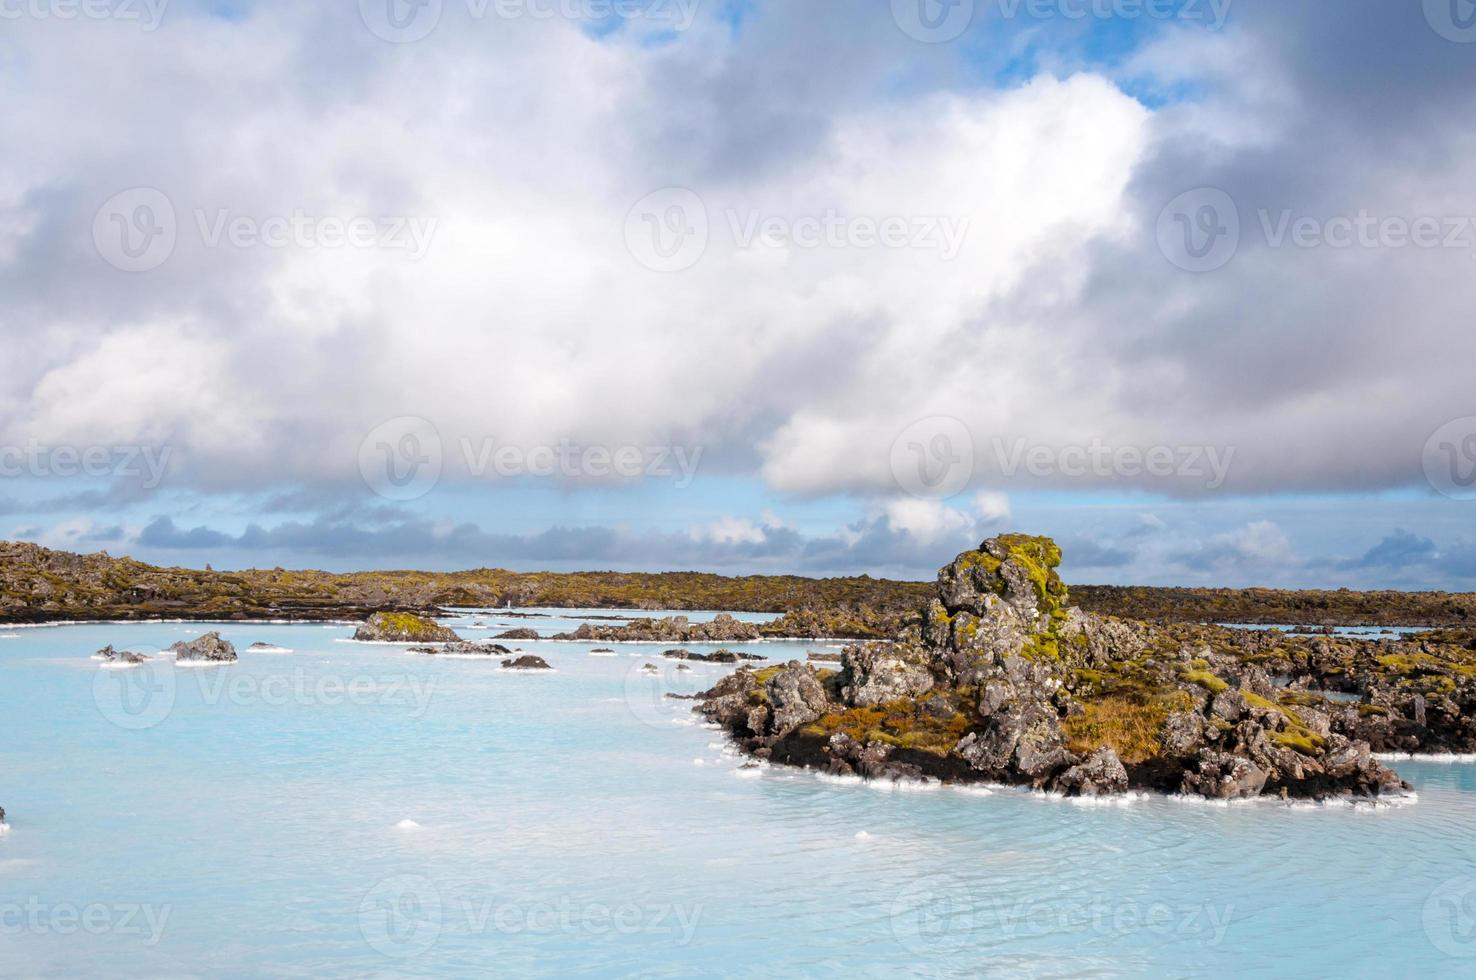 blauwe lagune - beroemde ijslandse spa foto